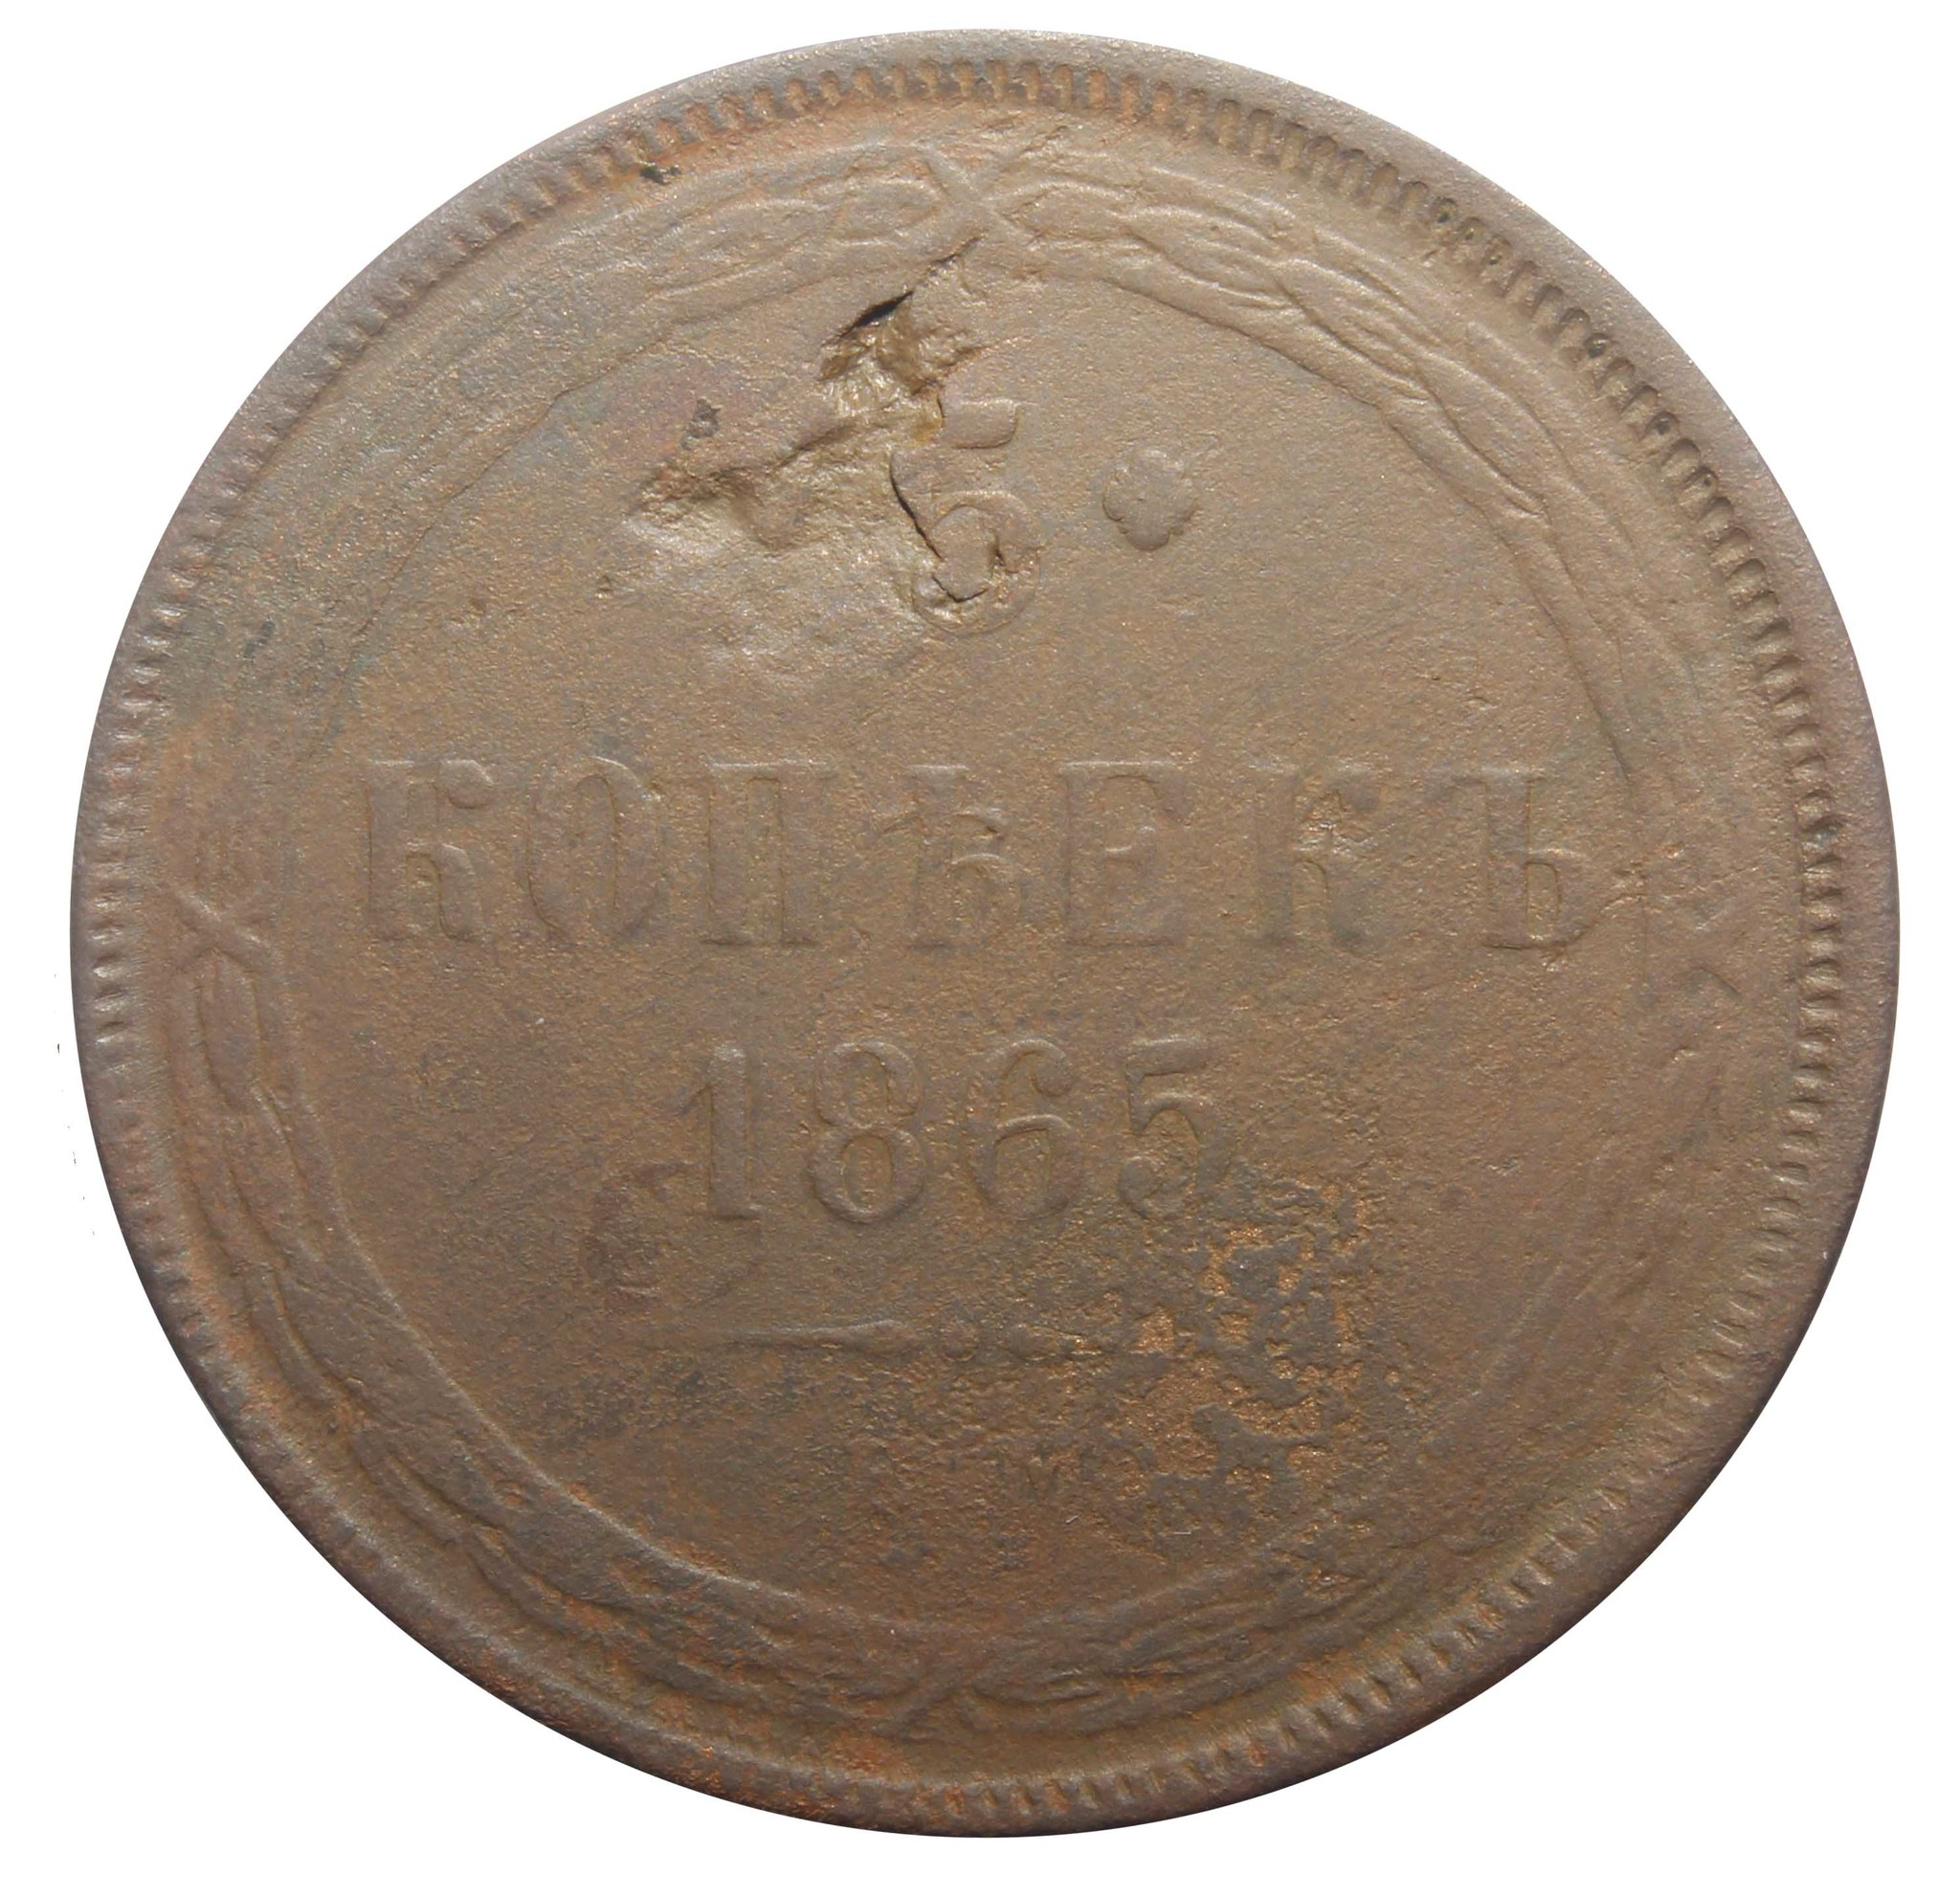 5 копеек. Александр II. ЕМ. 1865 год. VG